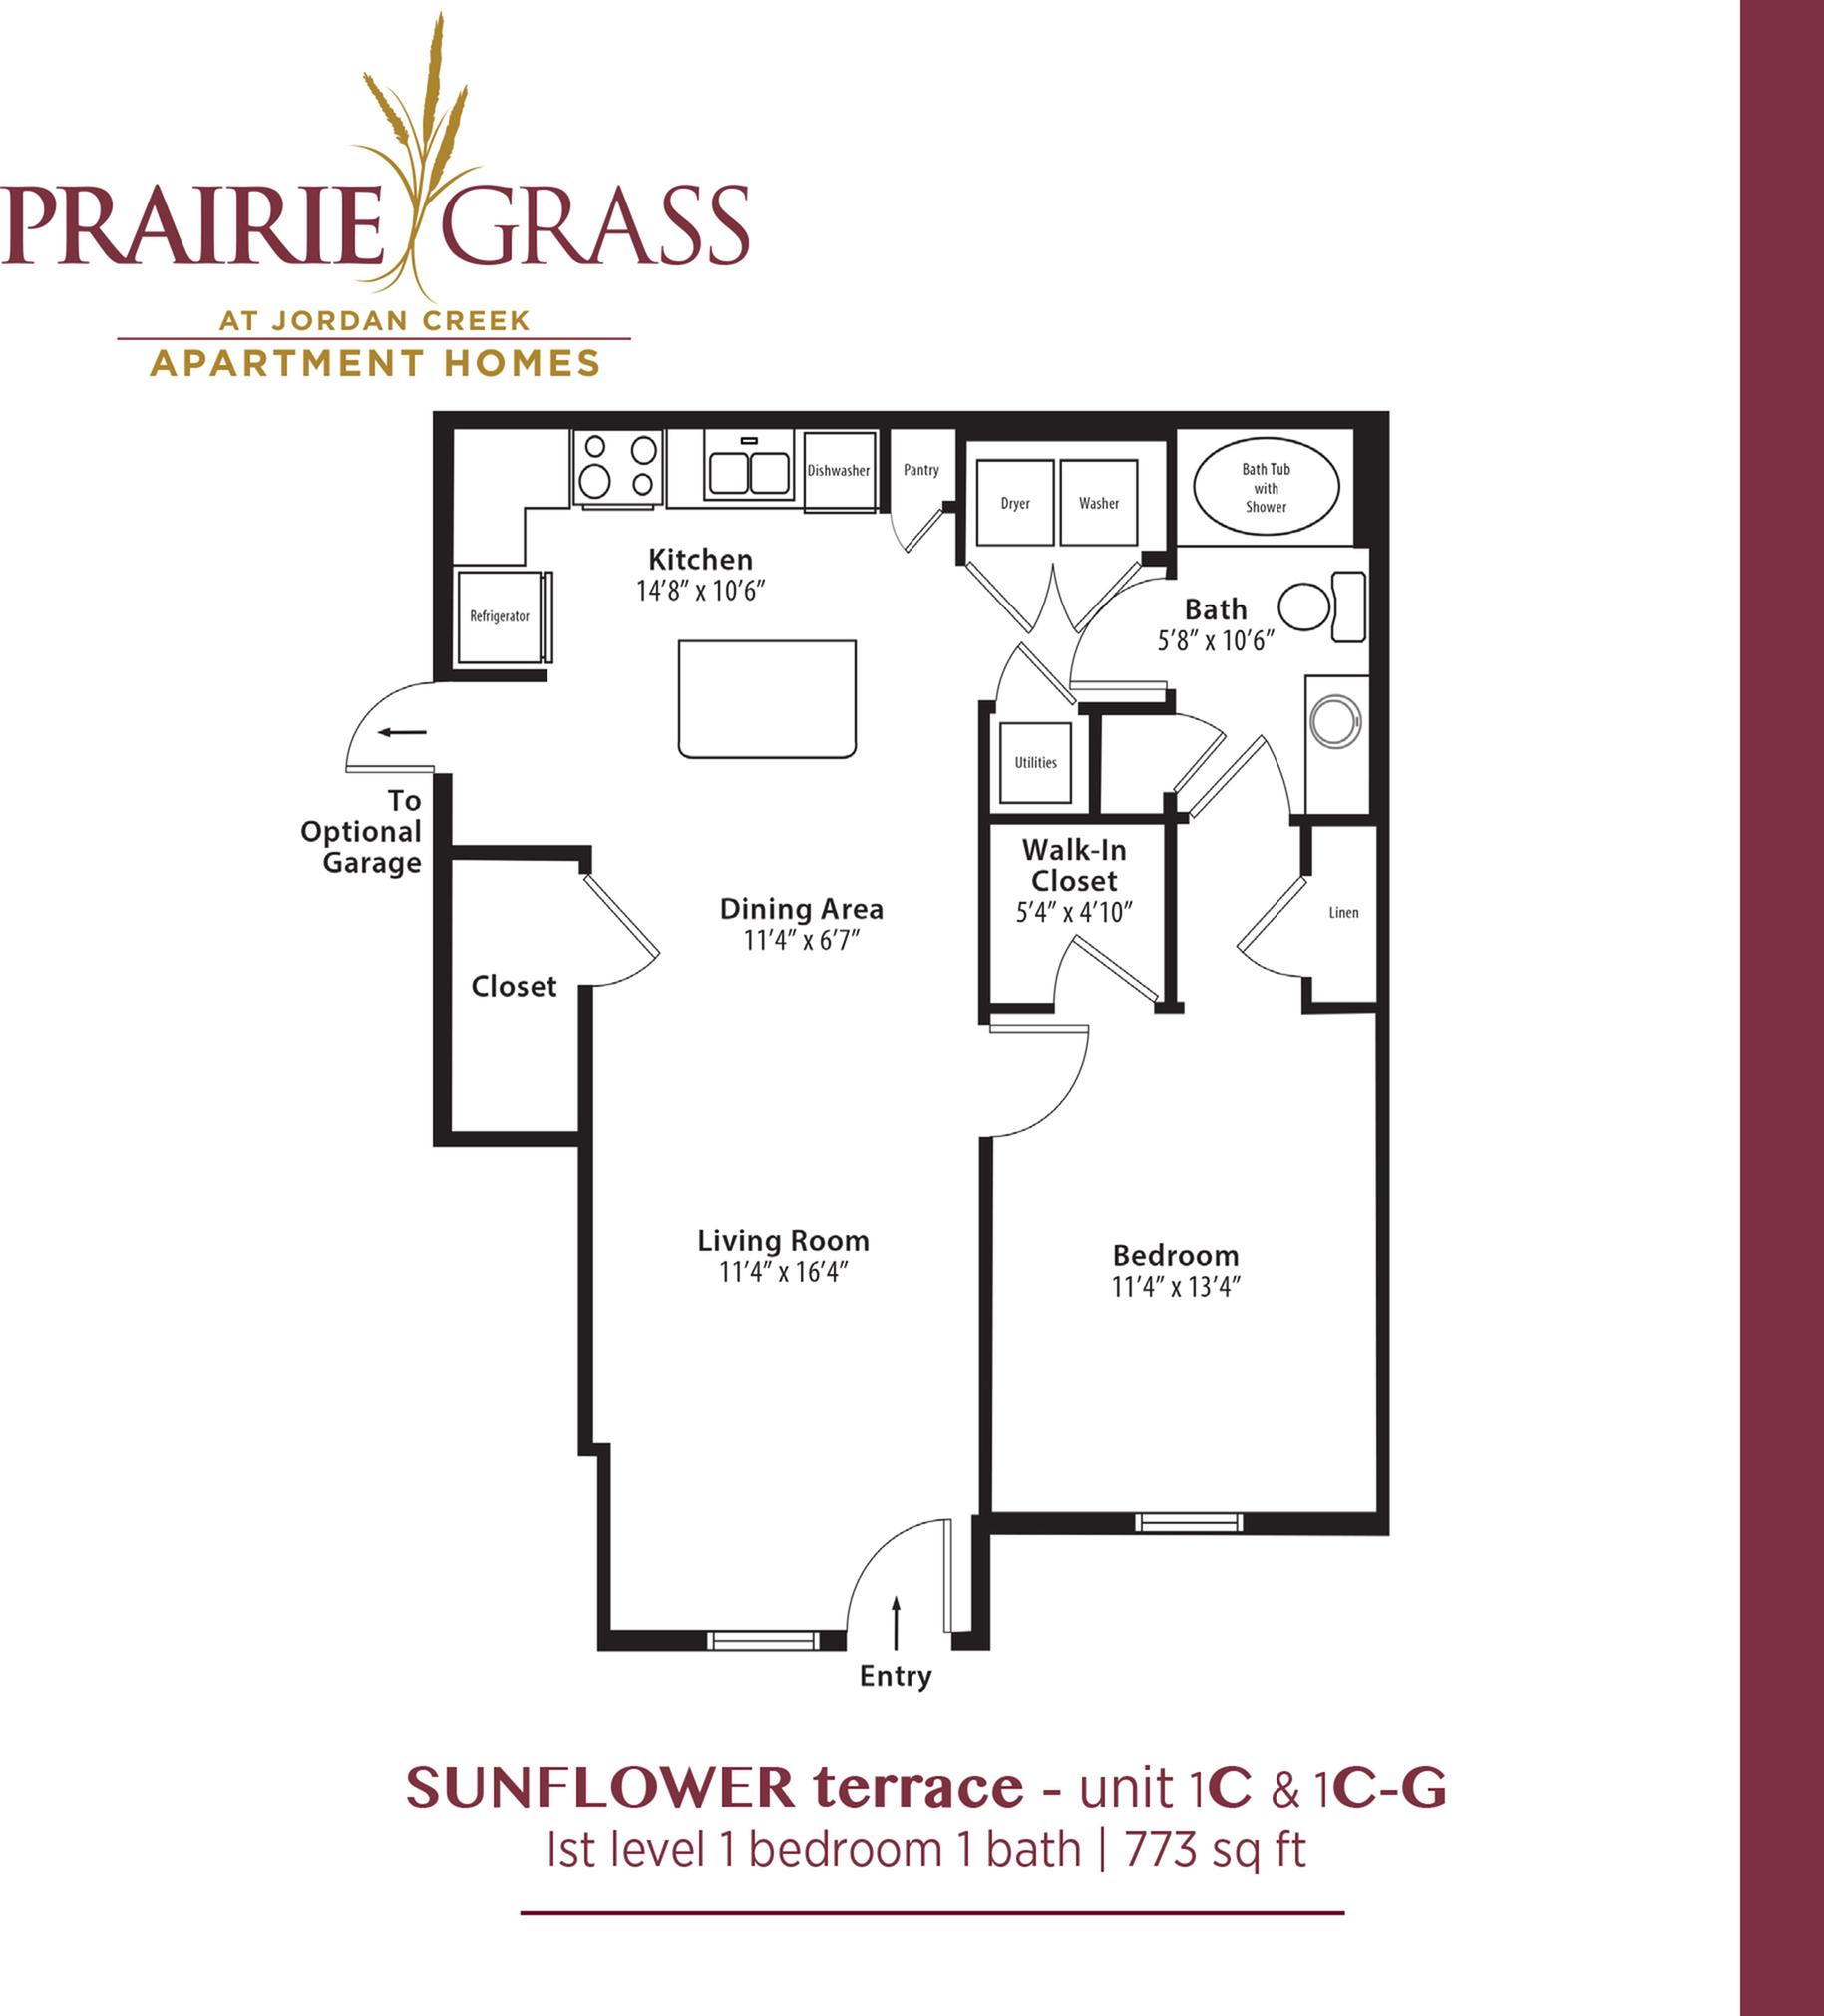 Sunflower Terrace - Lower 1 Bedroom